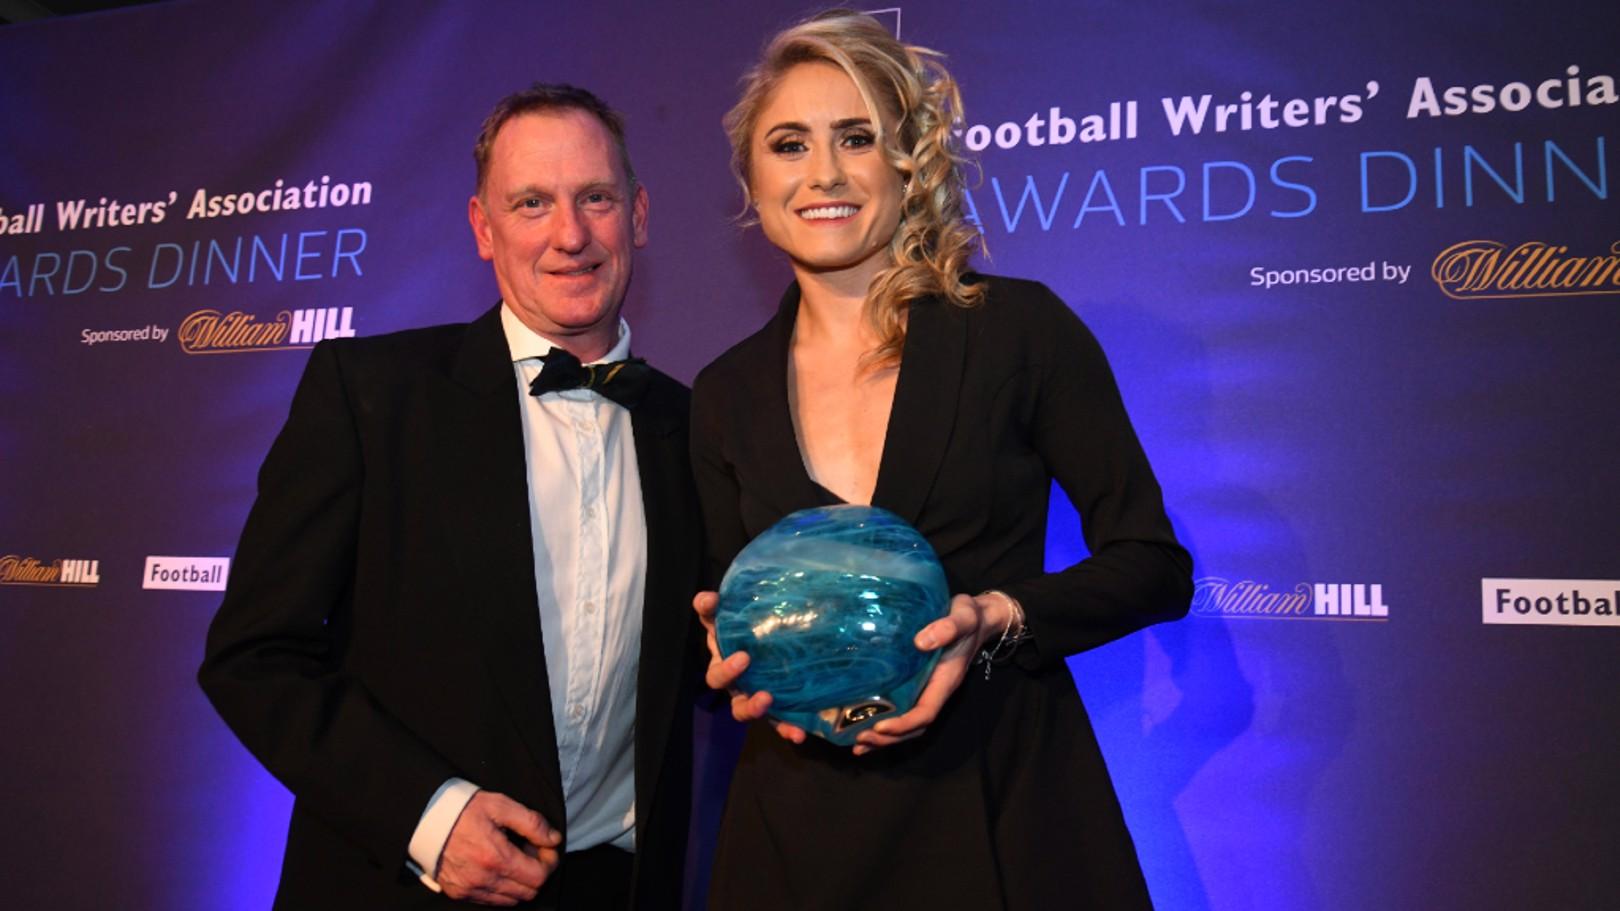 Houghton receives Football Writers' Association Award